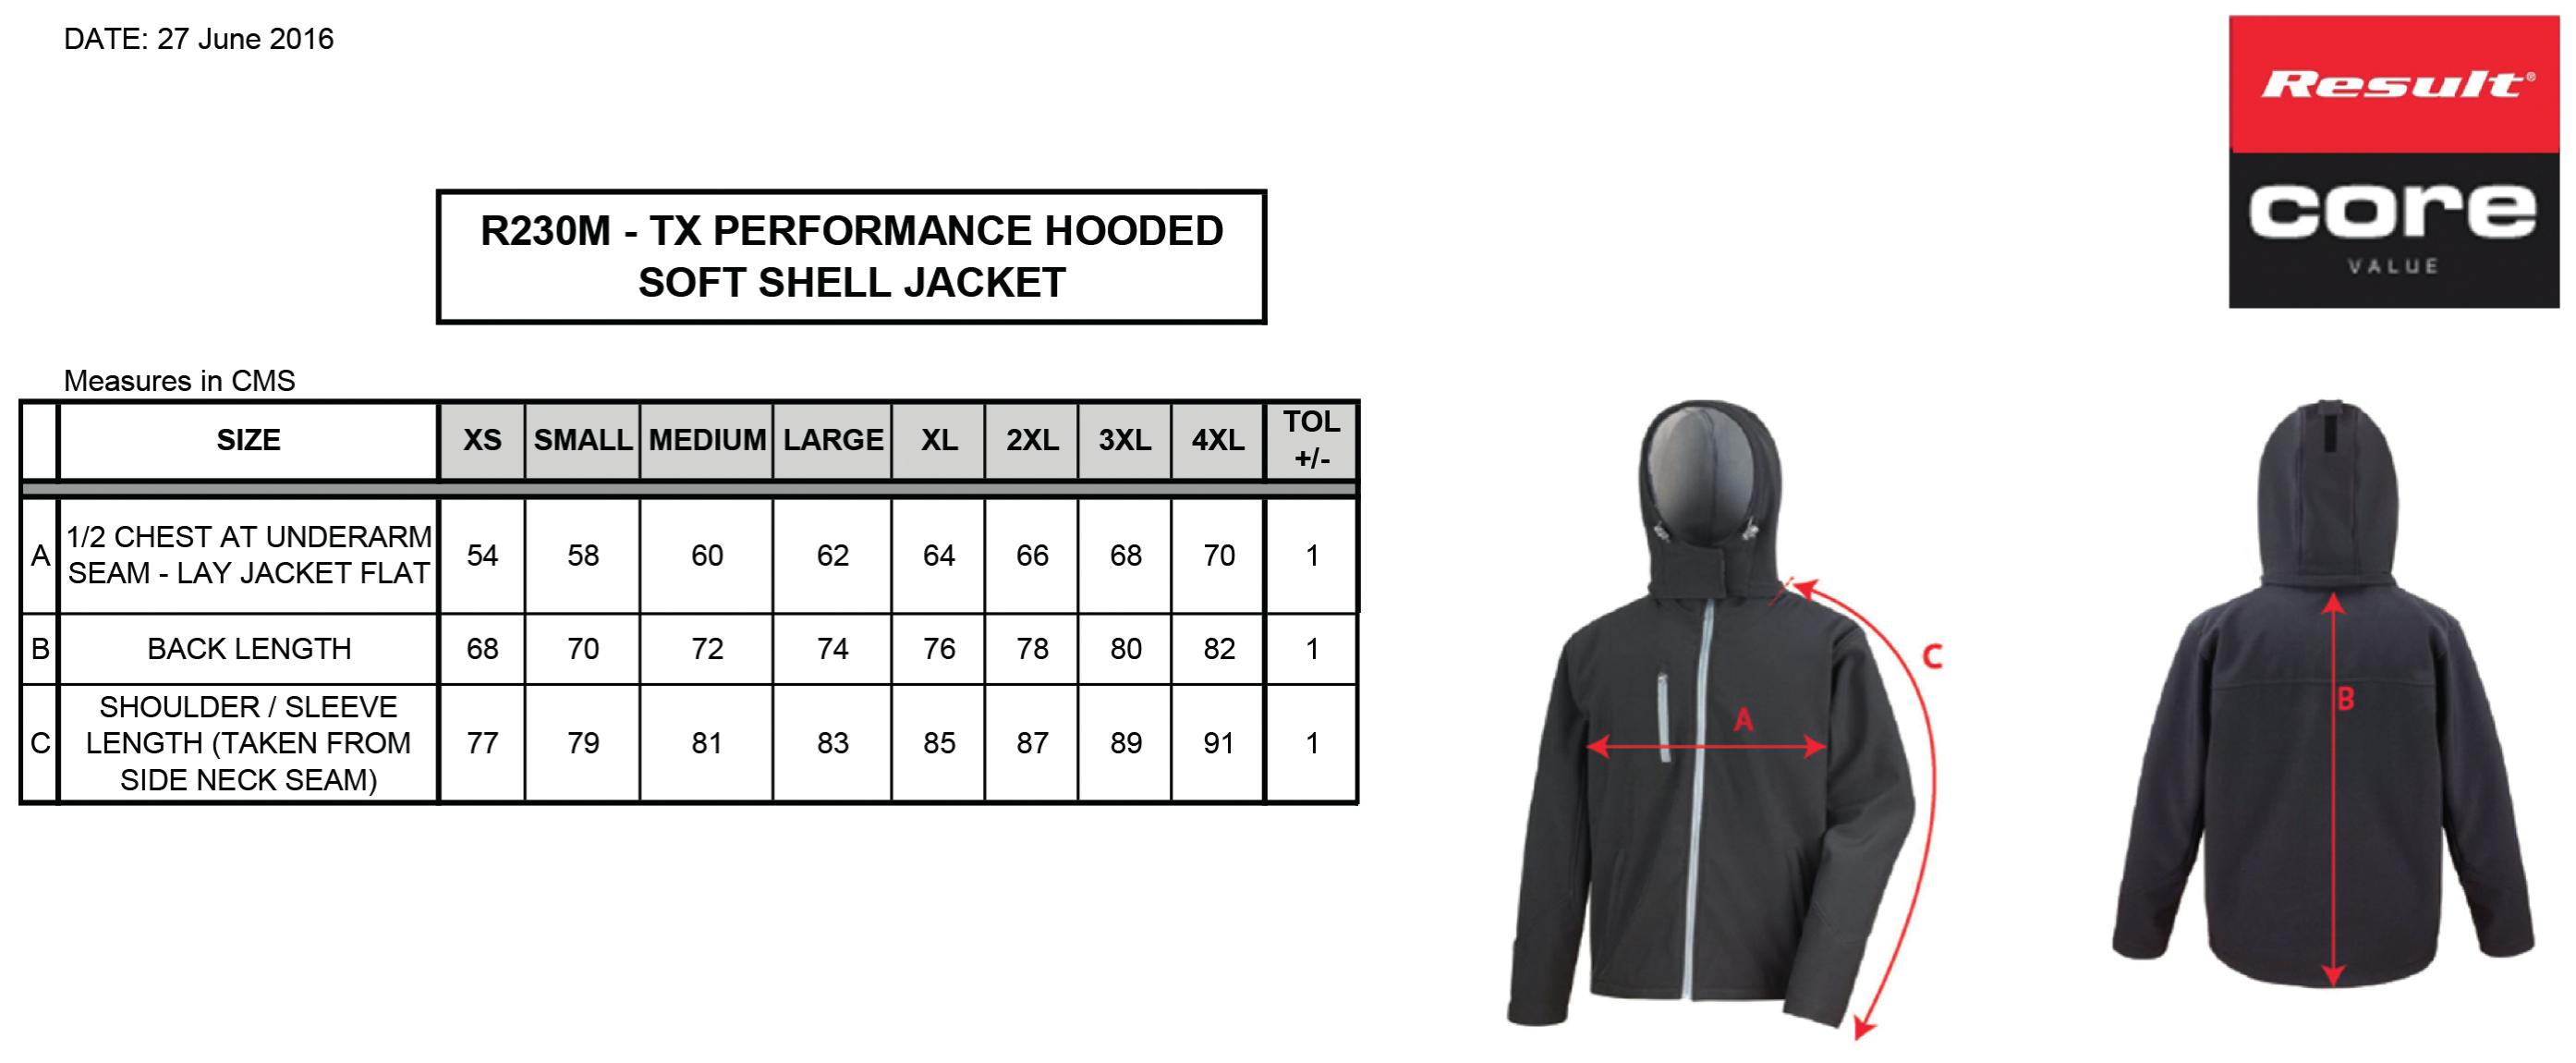 Result: TX Performance Hooded Softshell Jacket R230M